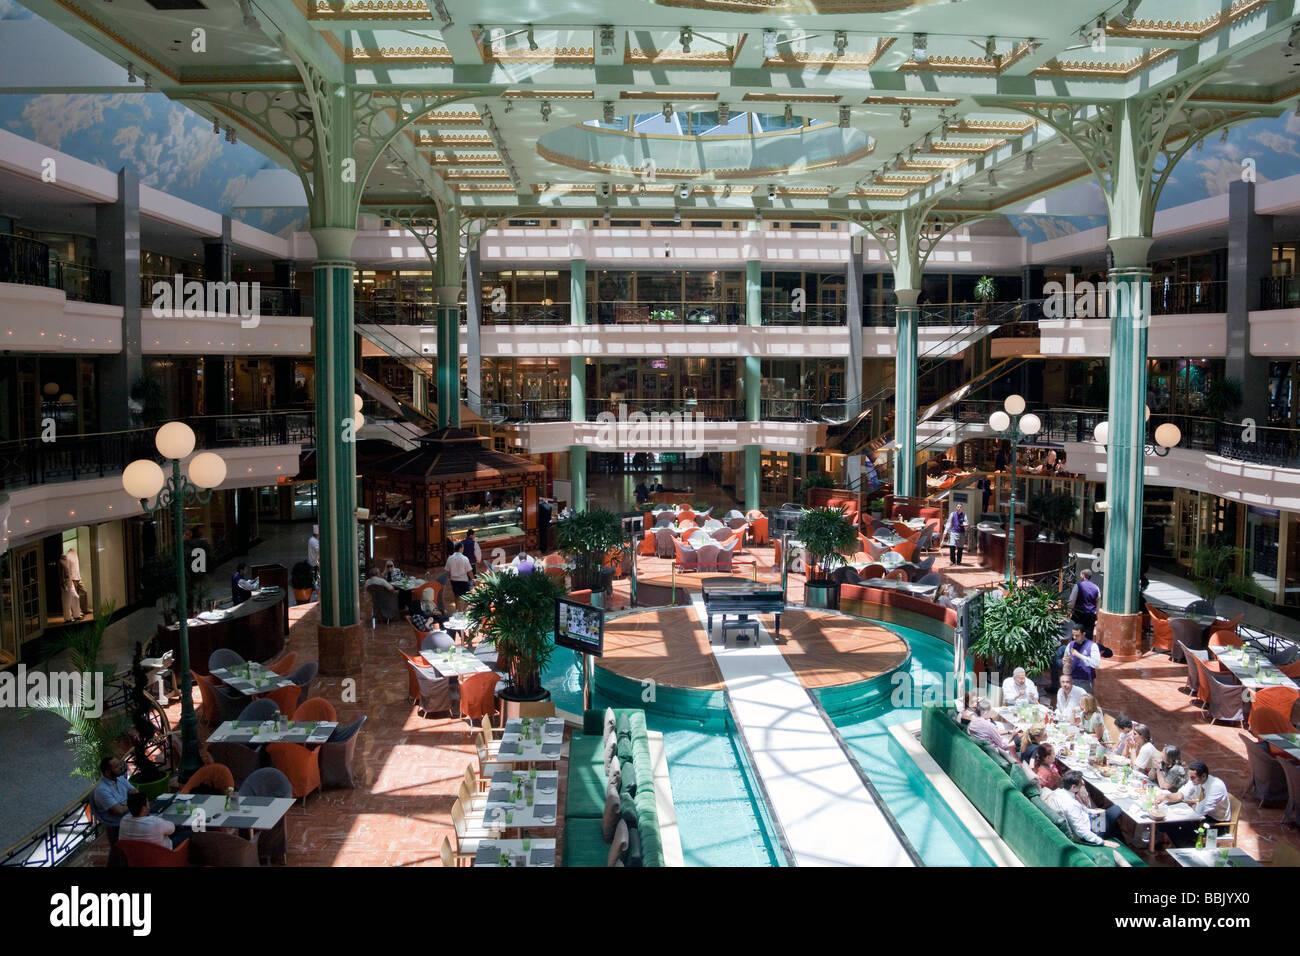 mall and restaurants, Four Seasons Hotel, Giza, Cairo, Egypt Stock Photo